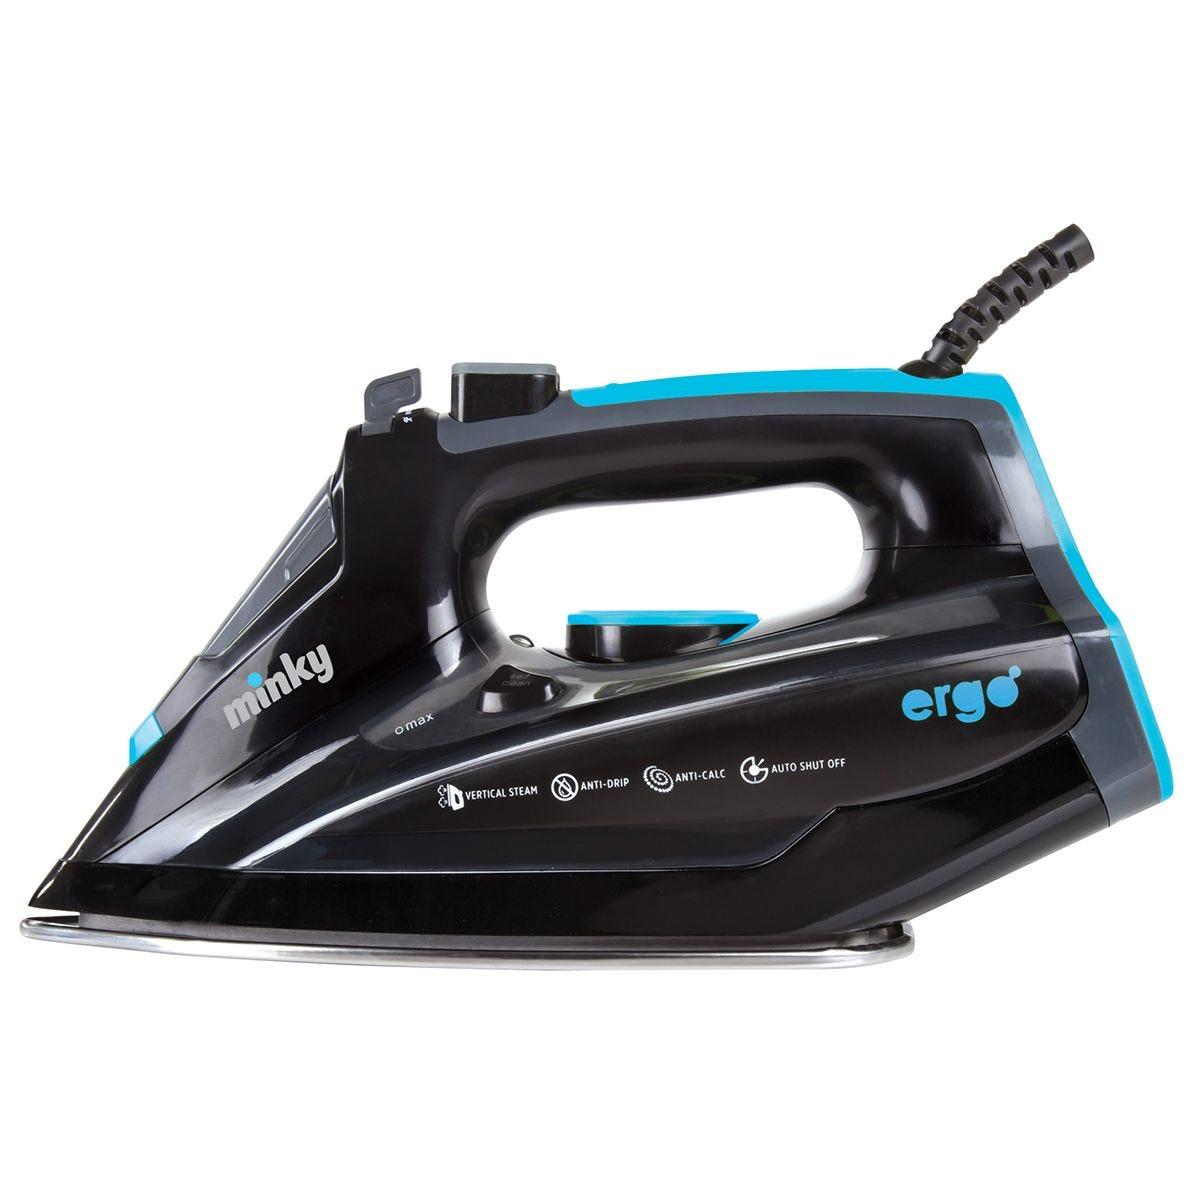 Minky VI10090101 Ergo Iron 2700W with Mirror Glide Soleplate – Black/Blue